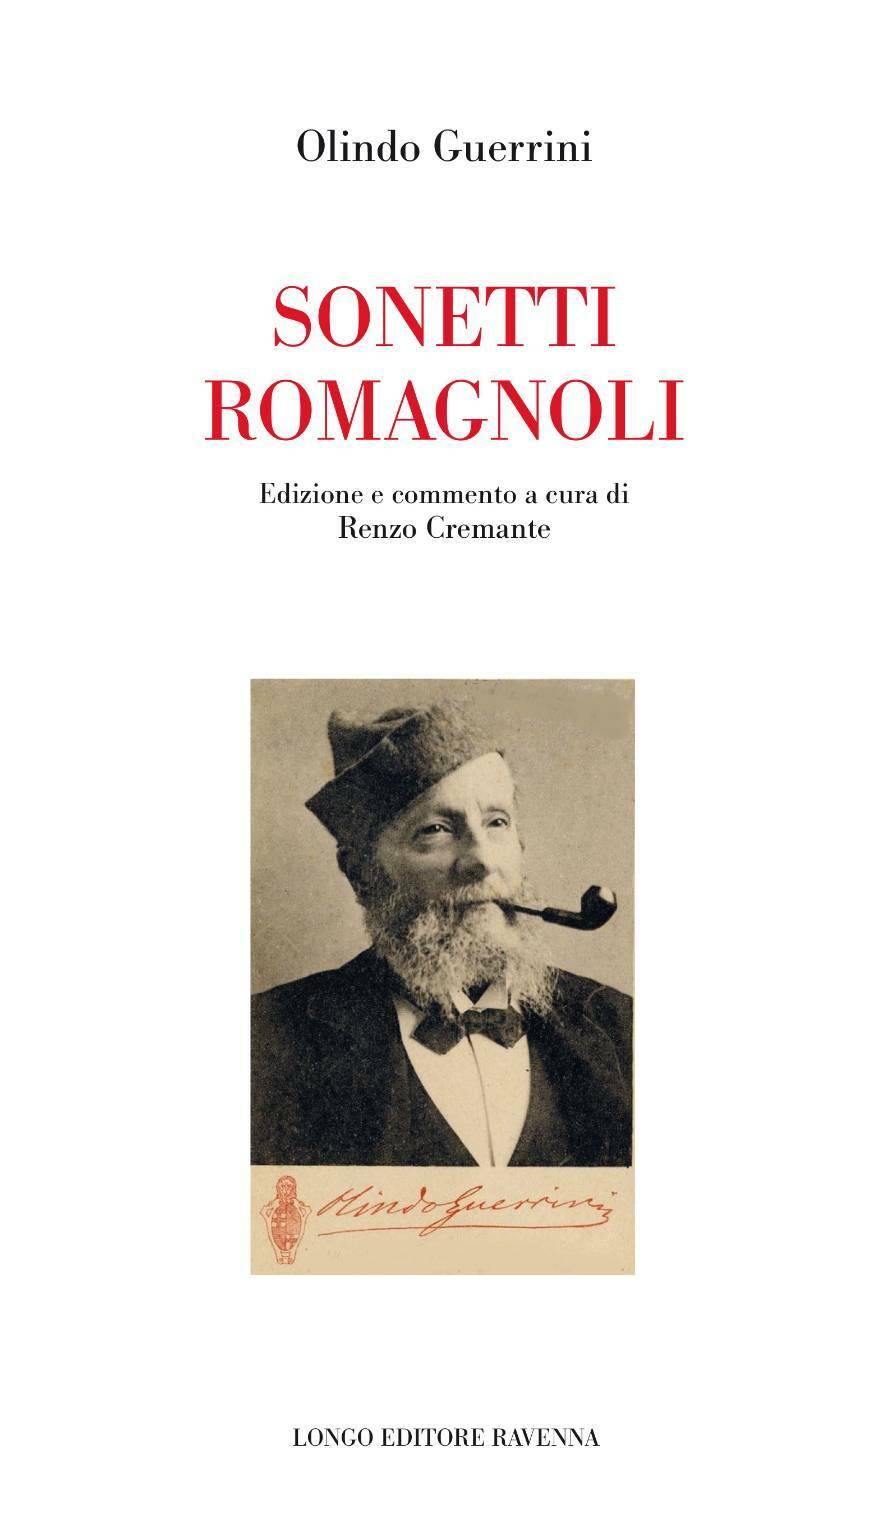 Sonetti_Romagnoli